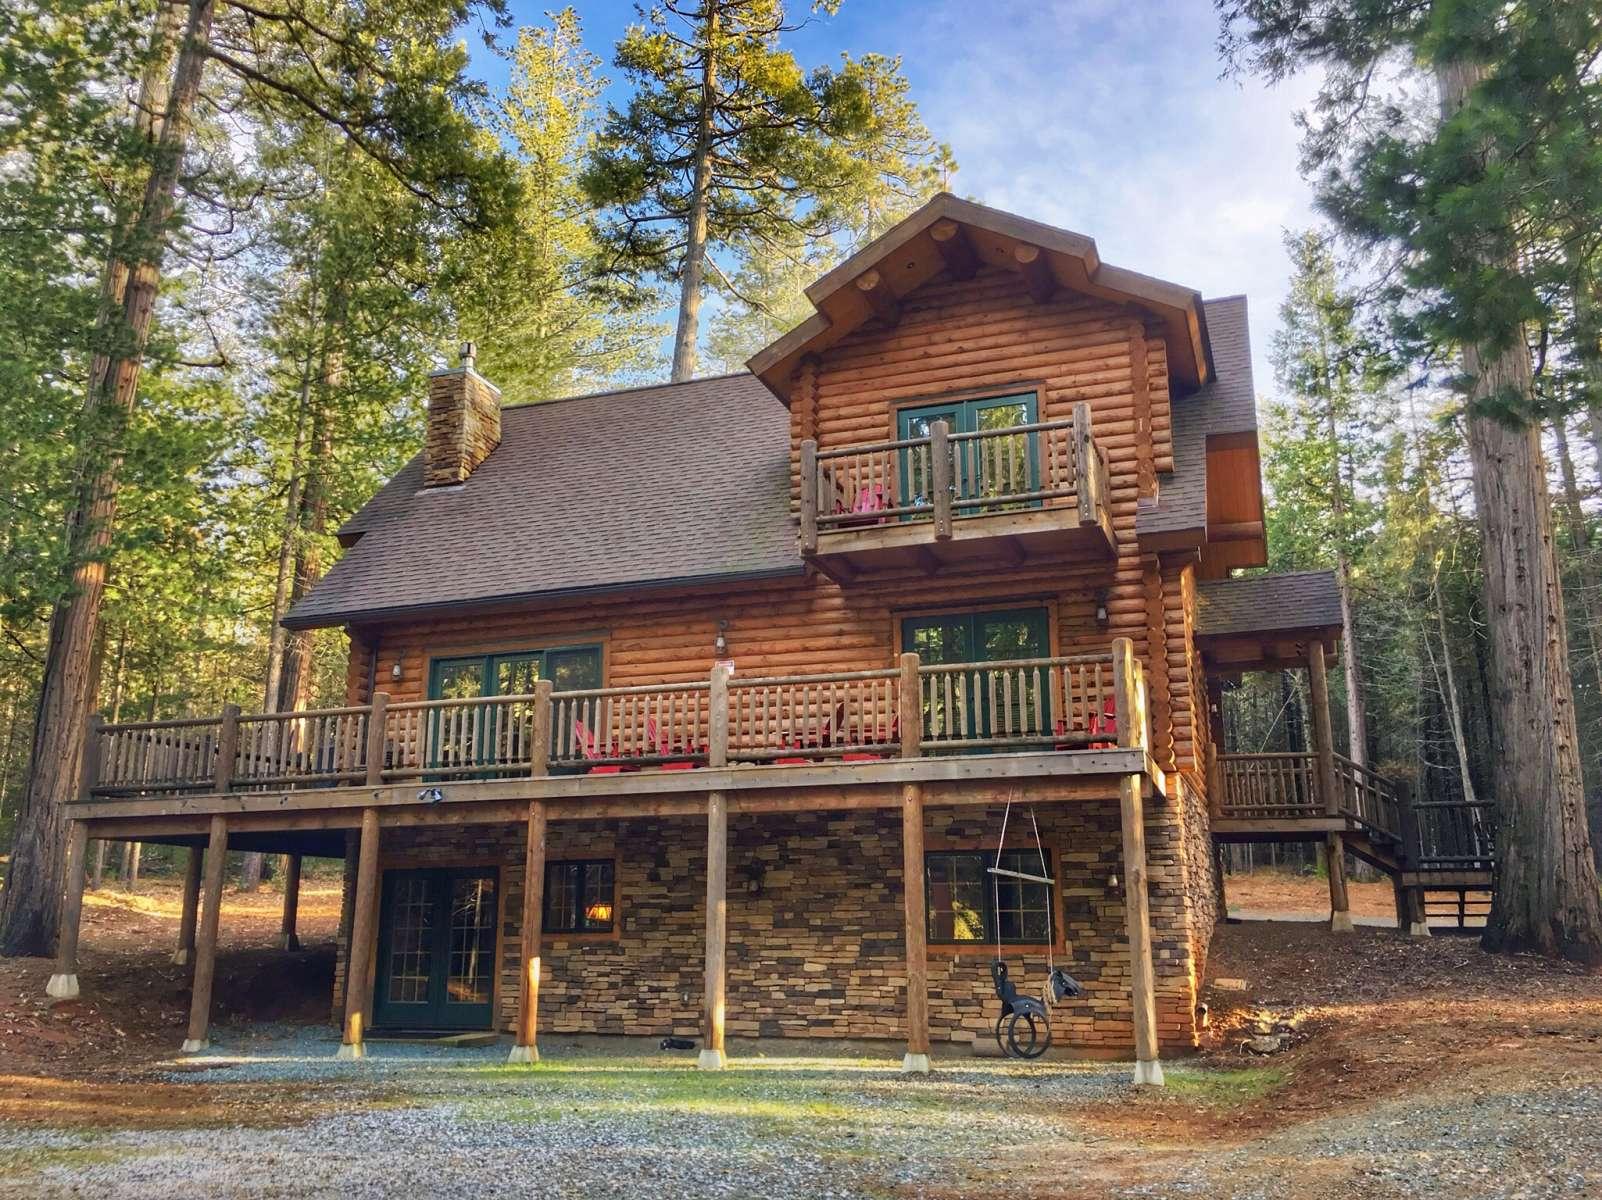 gold creek cabin sierra nevada foothills ca 5 hipcamper reviews